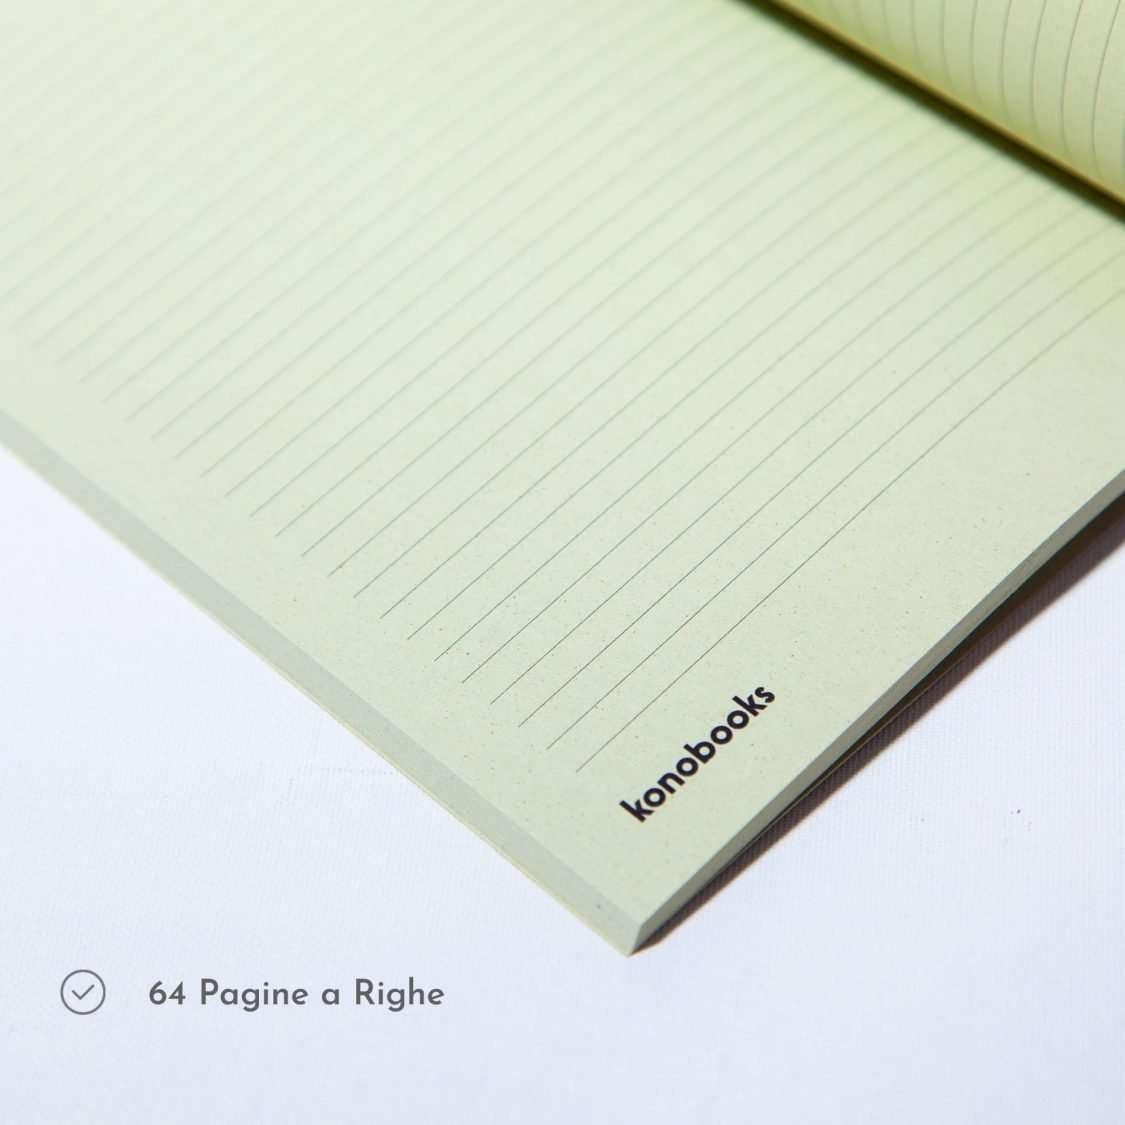 Quaderno ecologico a righe - Quaderno a righe in carta Kiwi - Konobooks